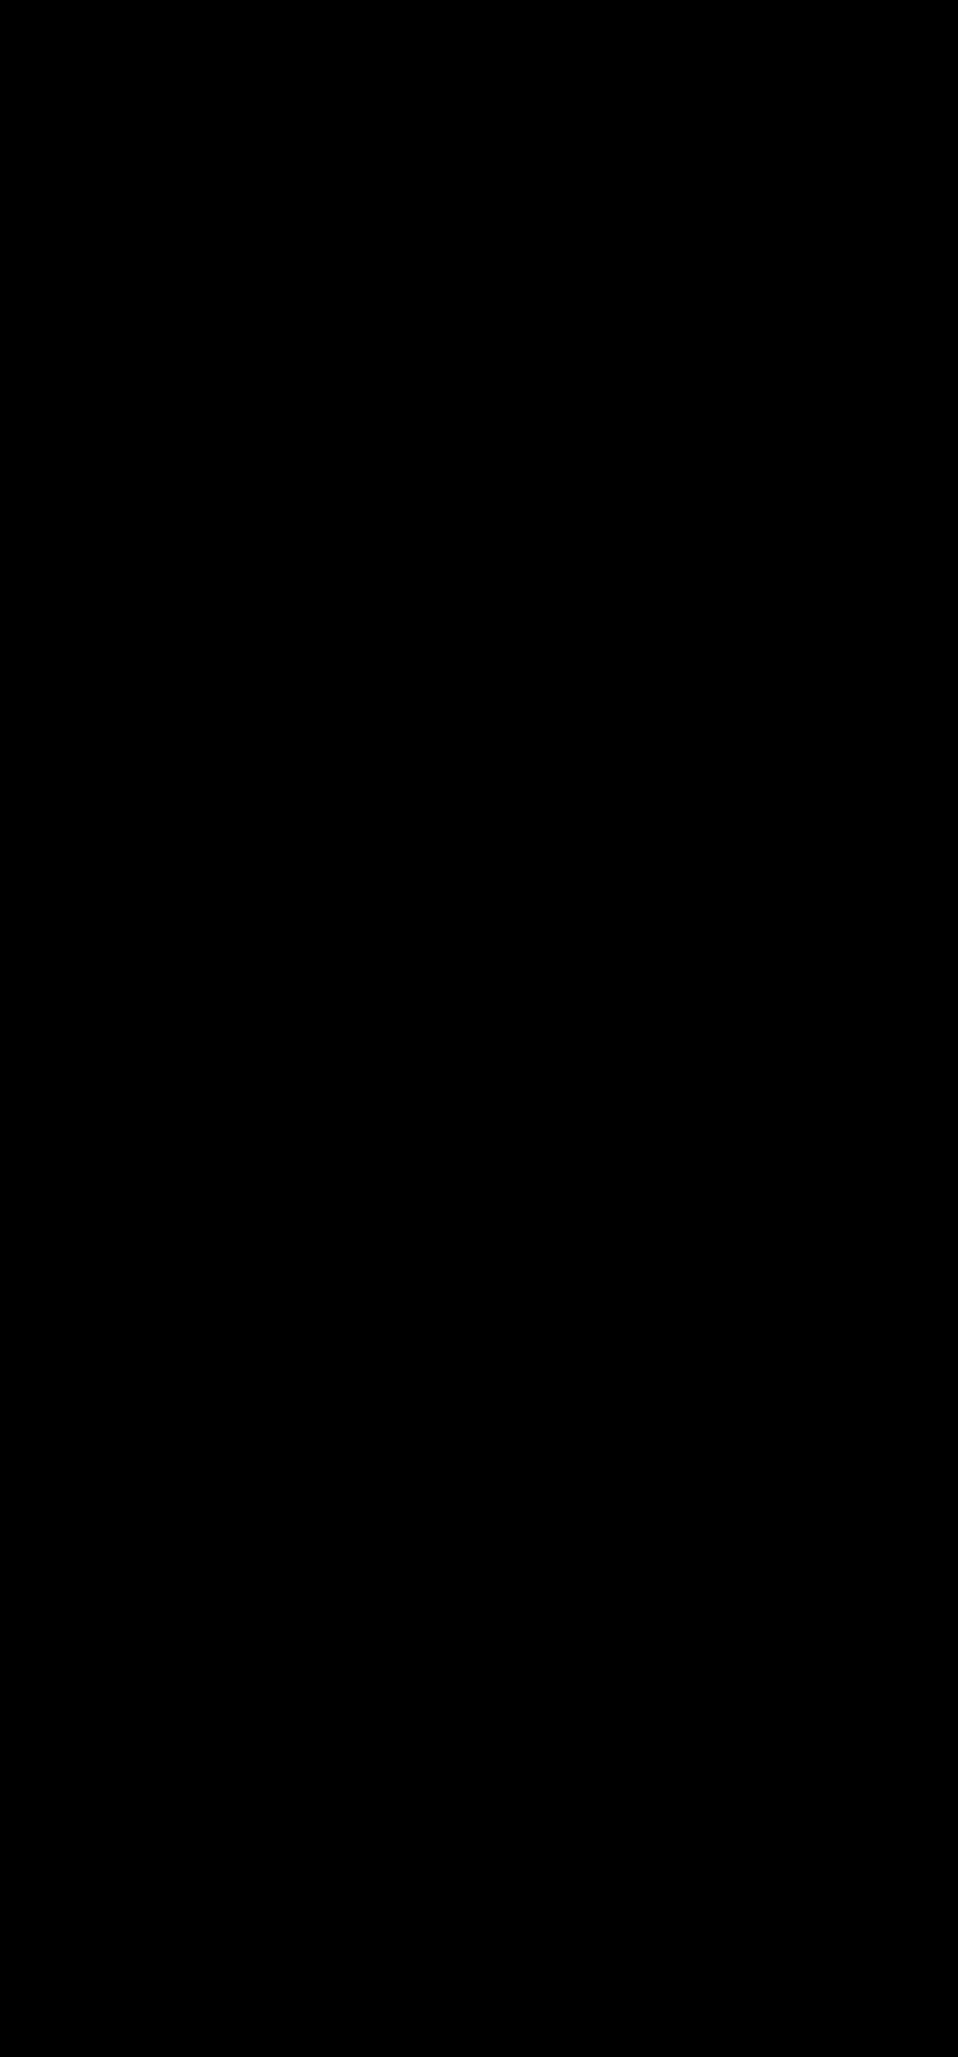 Human clipart female human. Public domain clip art